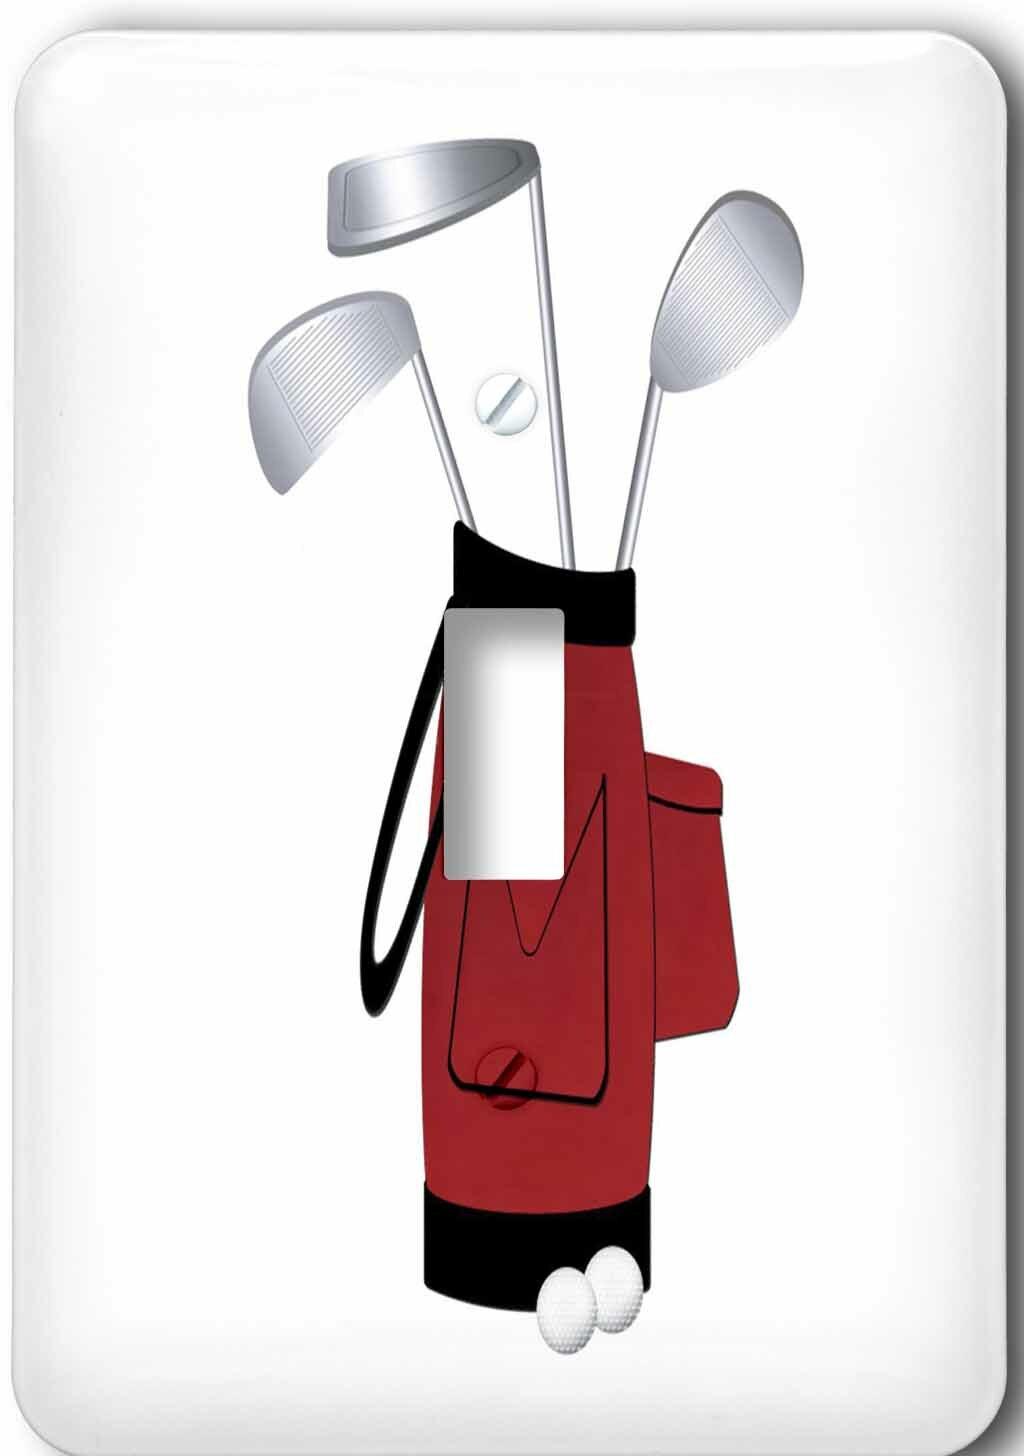 3drose Golf Bag 1 Gang Toggle Light Switch Wall Plate Wayfair